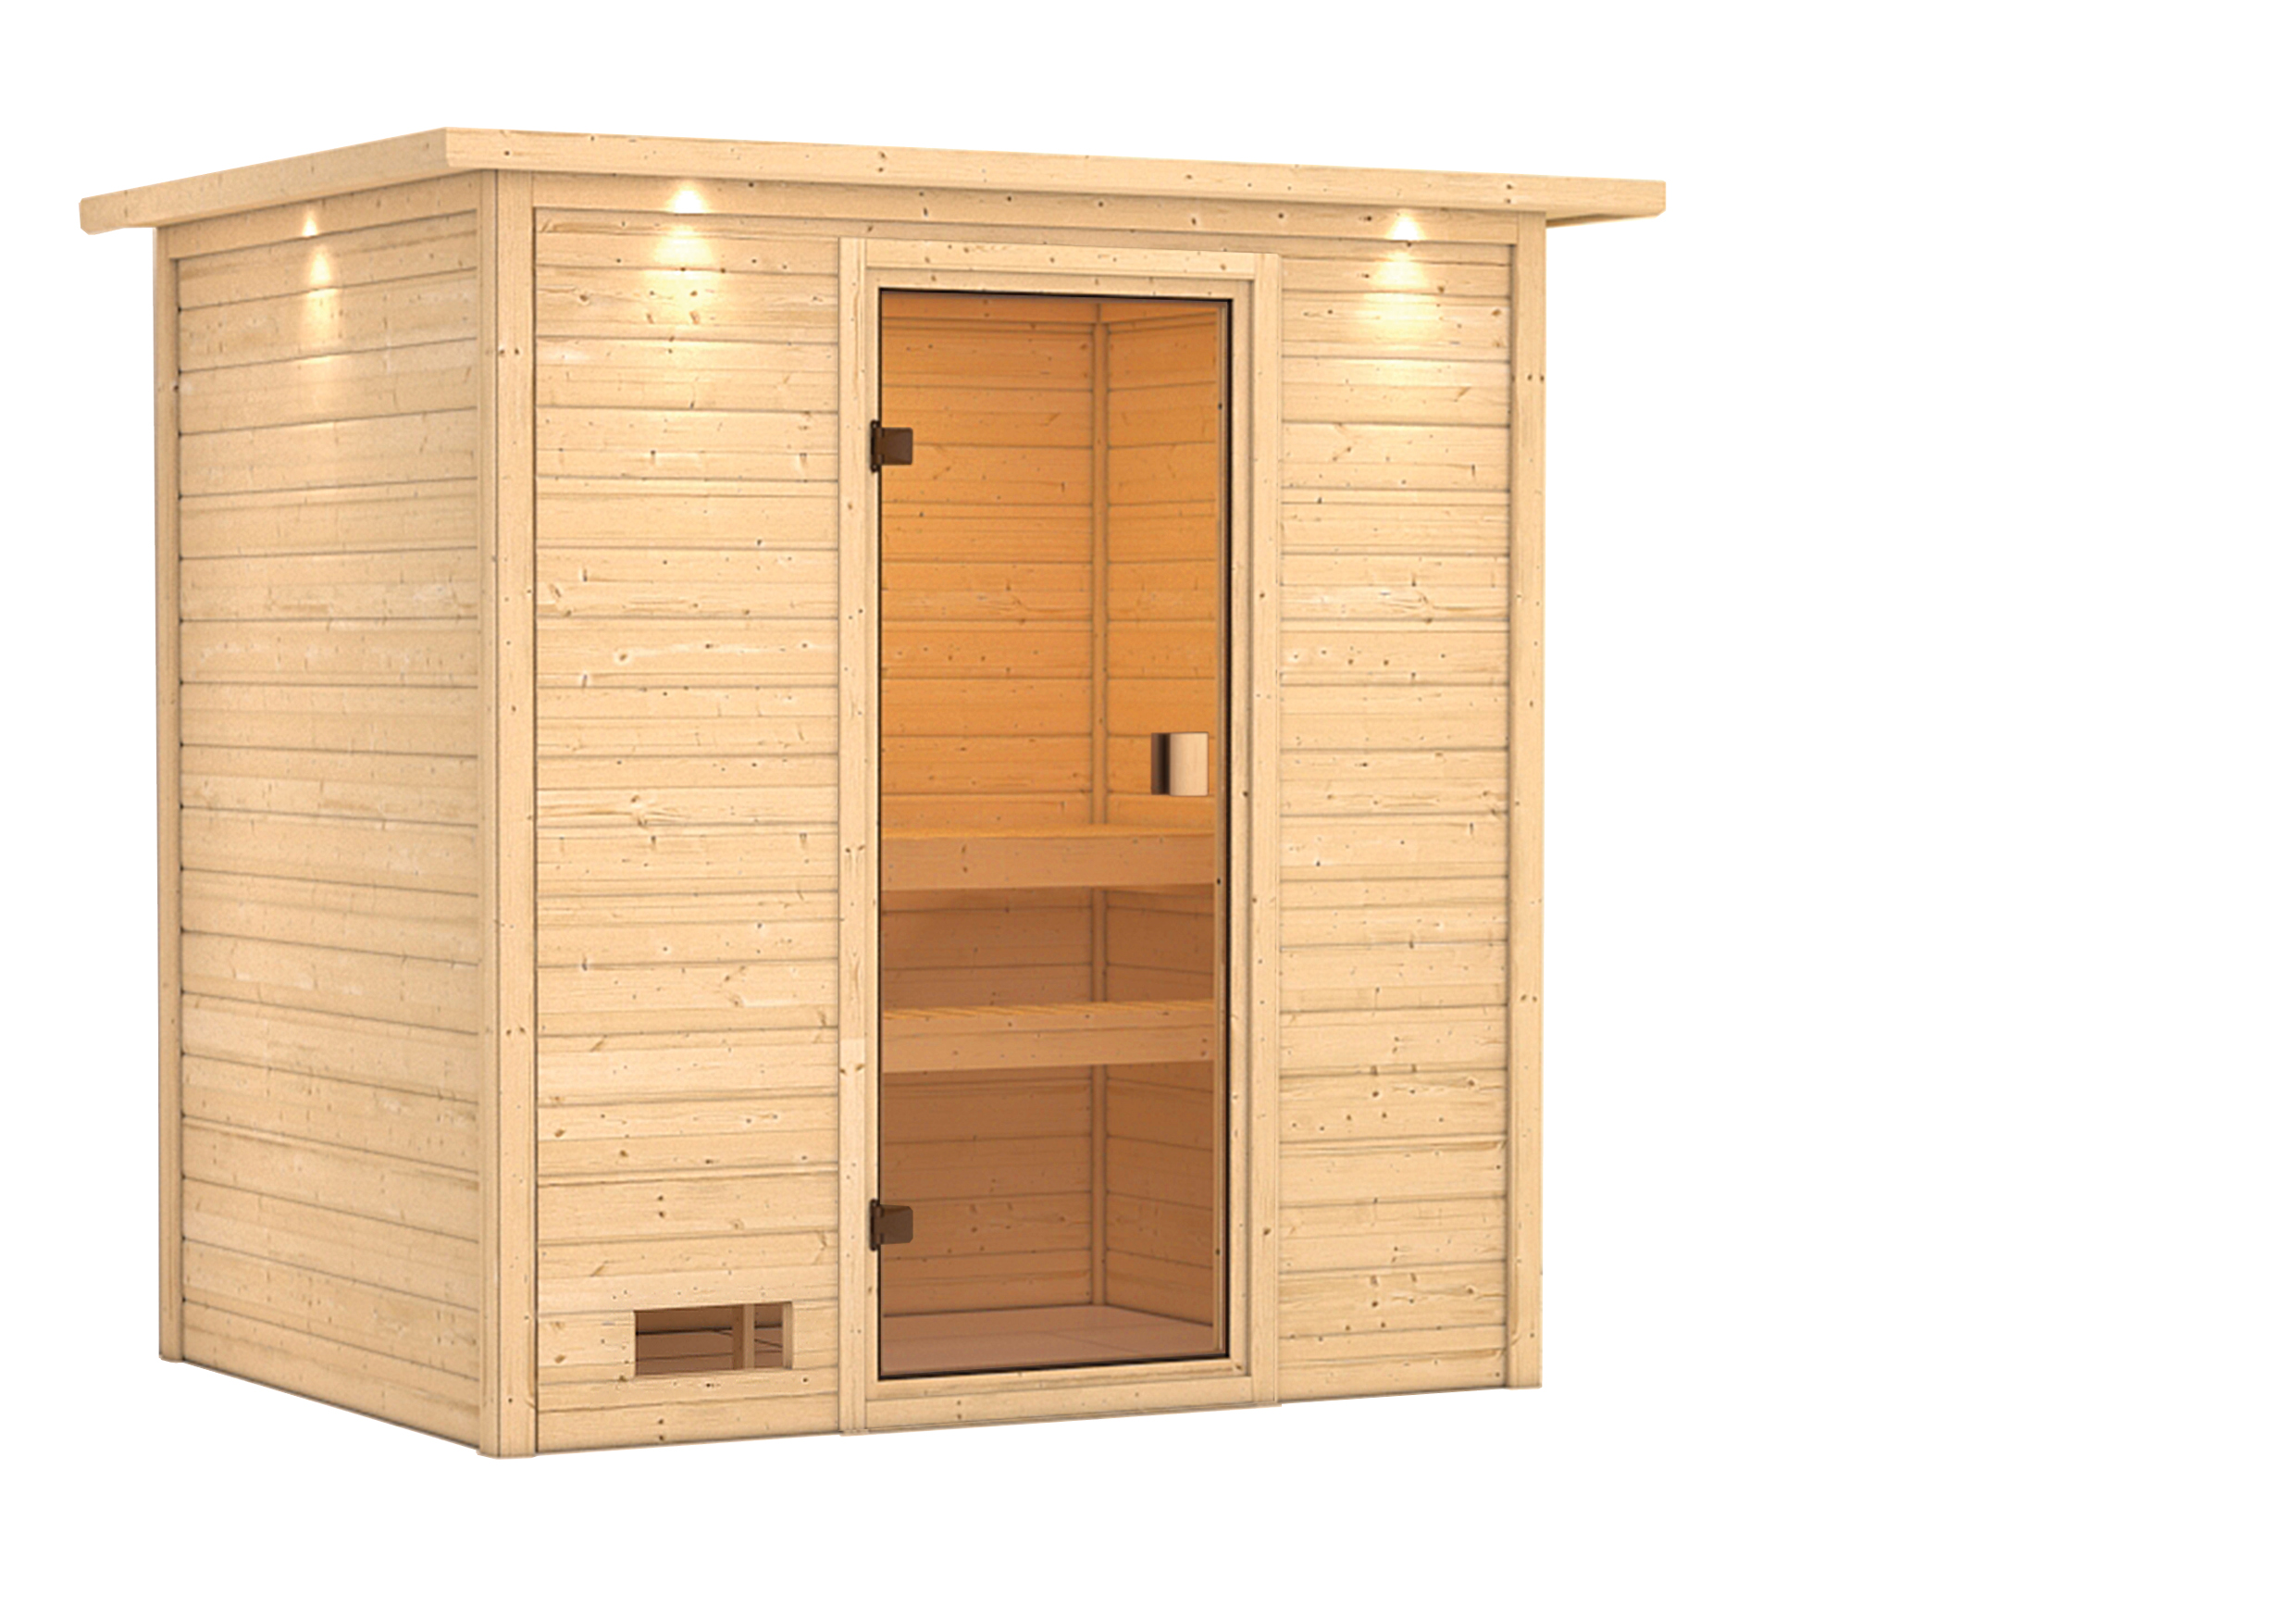 Woodfeeling Sauna Selena 38mm Dachkranz ohne Saunaofen Bild 4